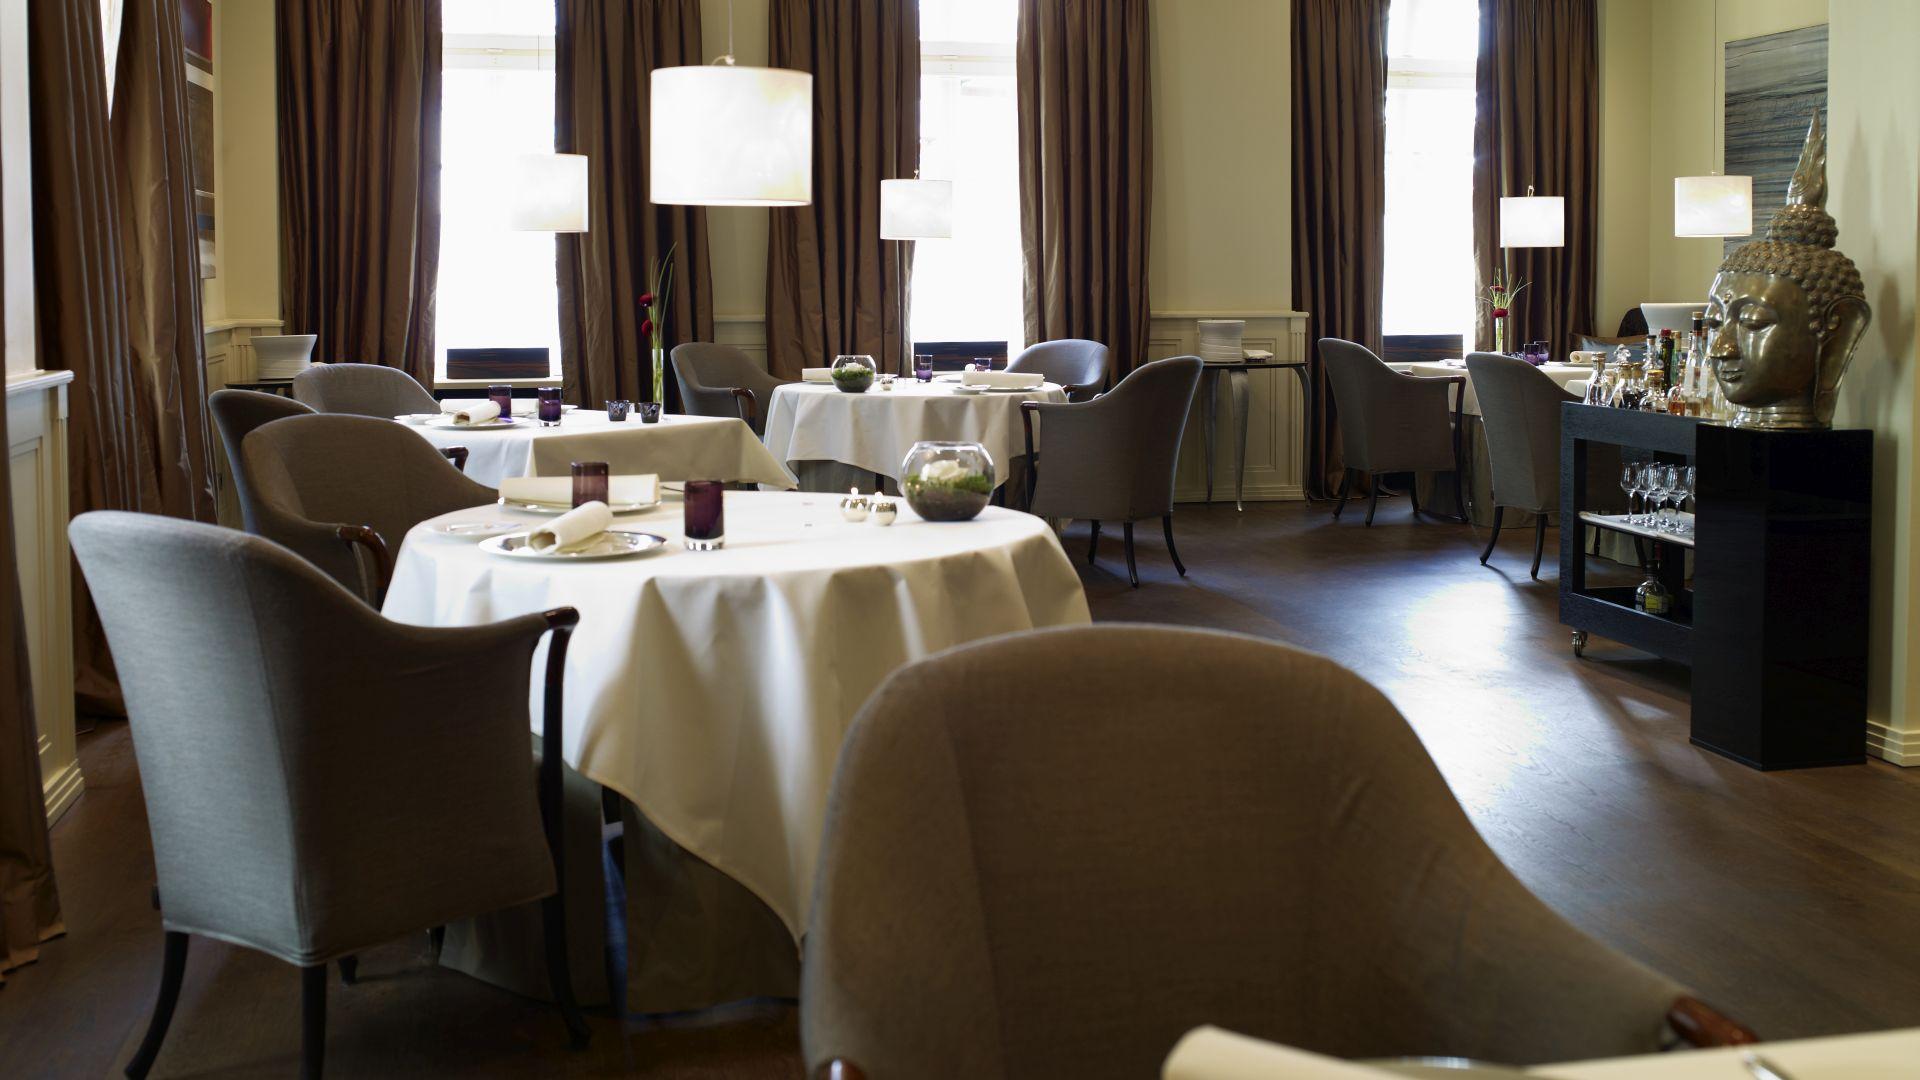 thomas b hner feiert mit seinem 3 sterne gourmet restaurant la vie in osnabr ck 10 j hriges. Black Bedroom Furniture Sets. Home Design Ideas